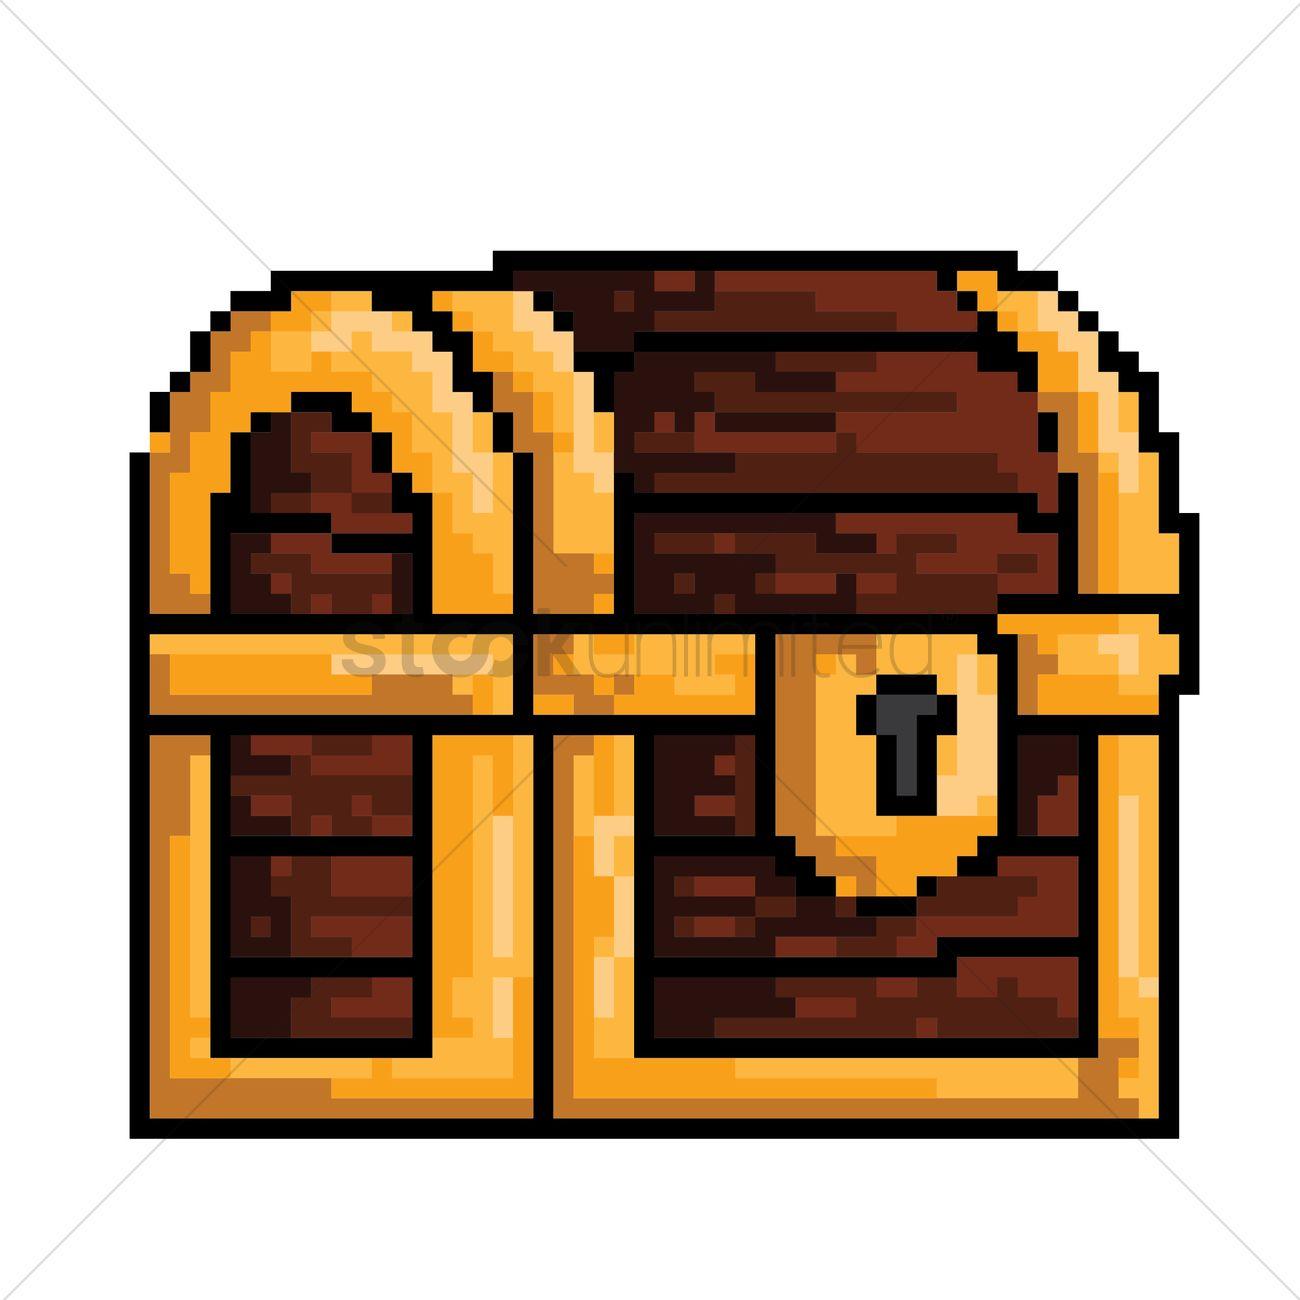 Pixel Art Treasure Chest Vector Image 1959576 Stockunlimited